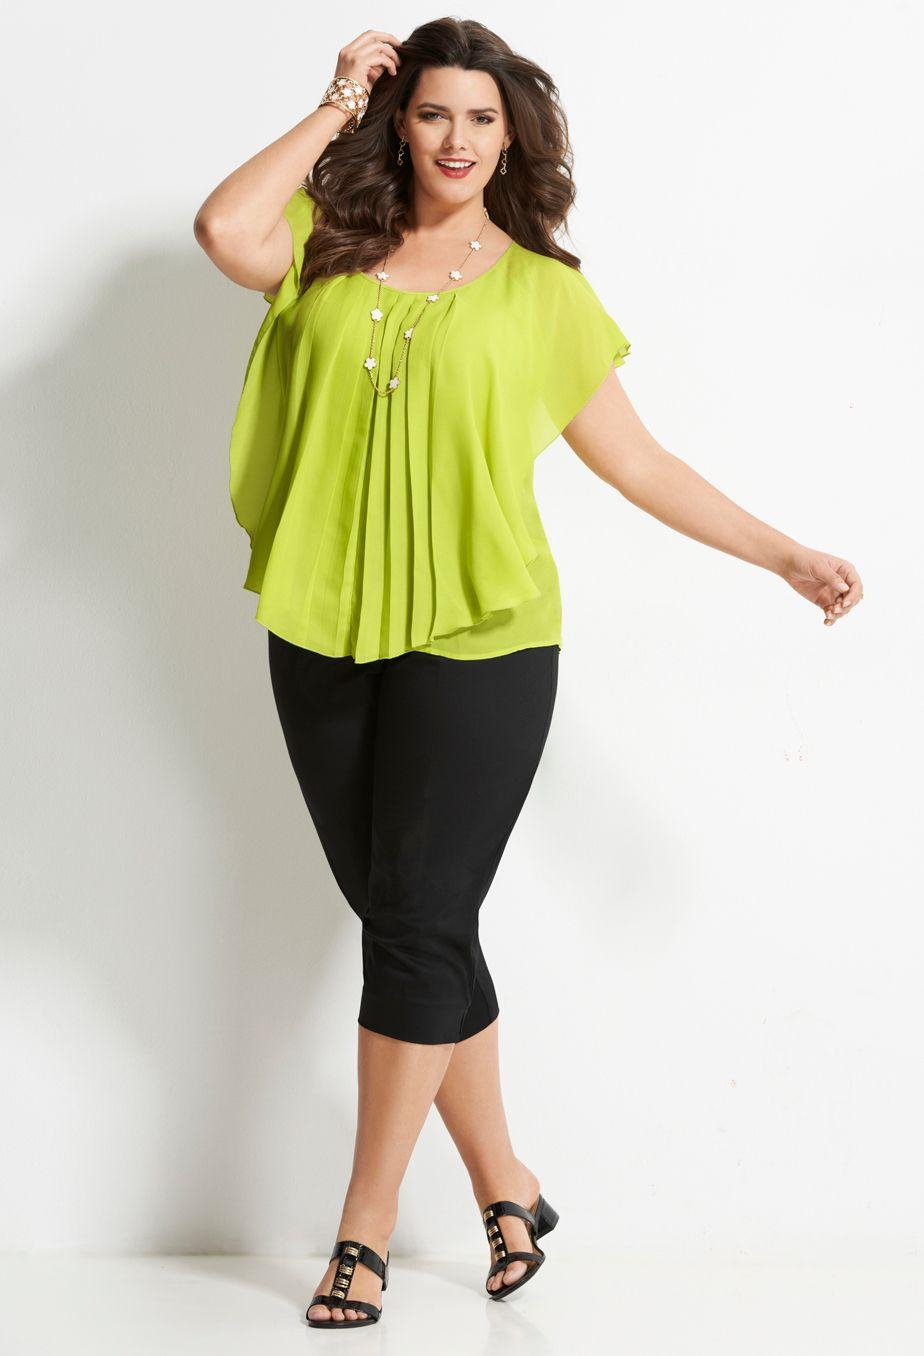 bold blouses plus size outfits avenue kurvenstar pinterest mode kleidung und damen mode. Black Bedroom Furniture Sets. Home Design Ideas